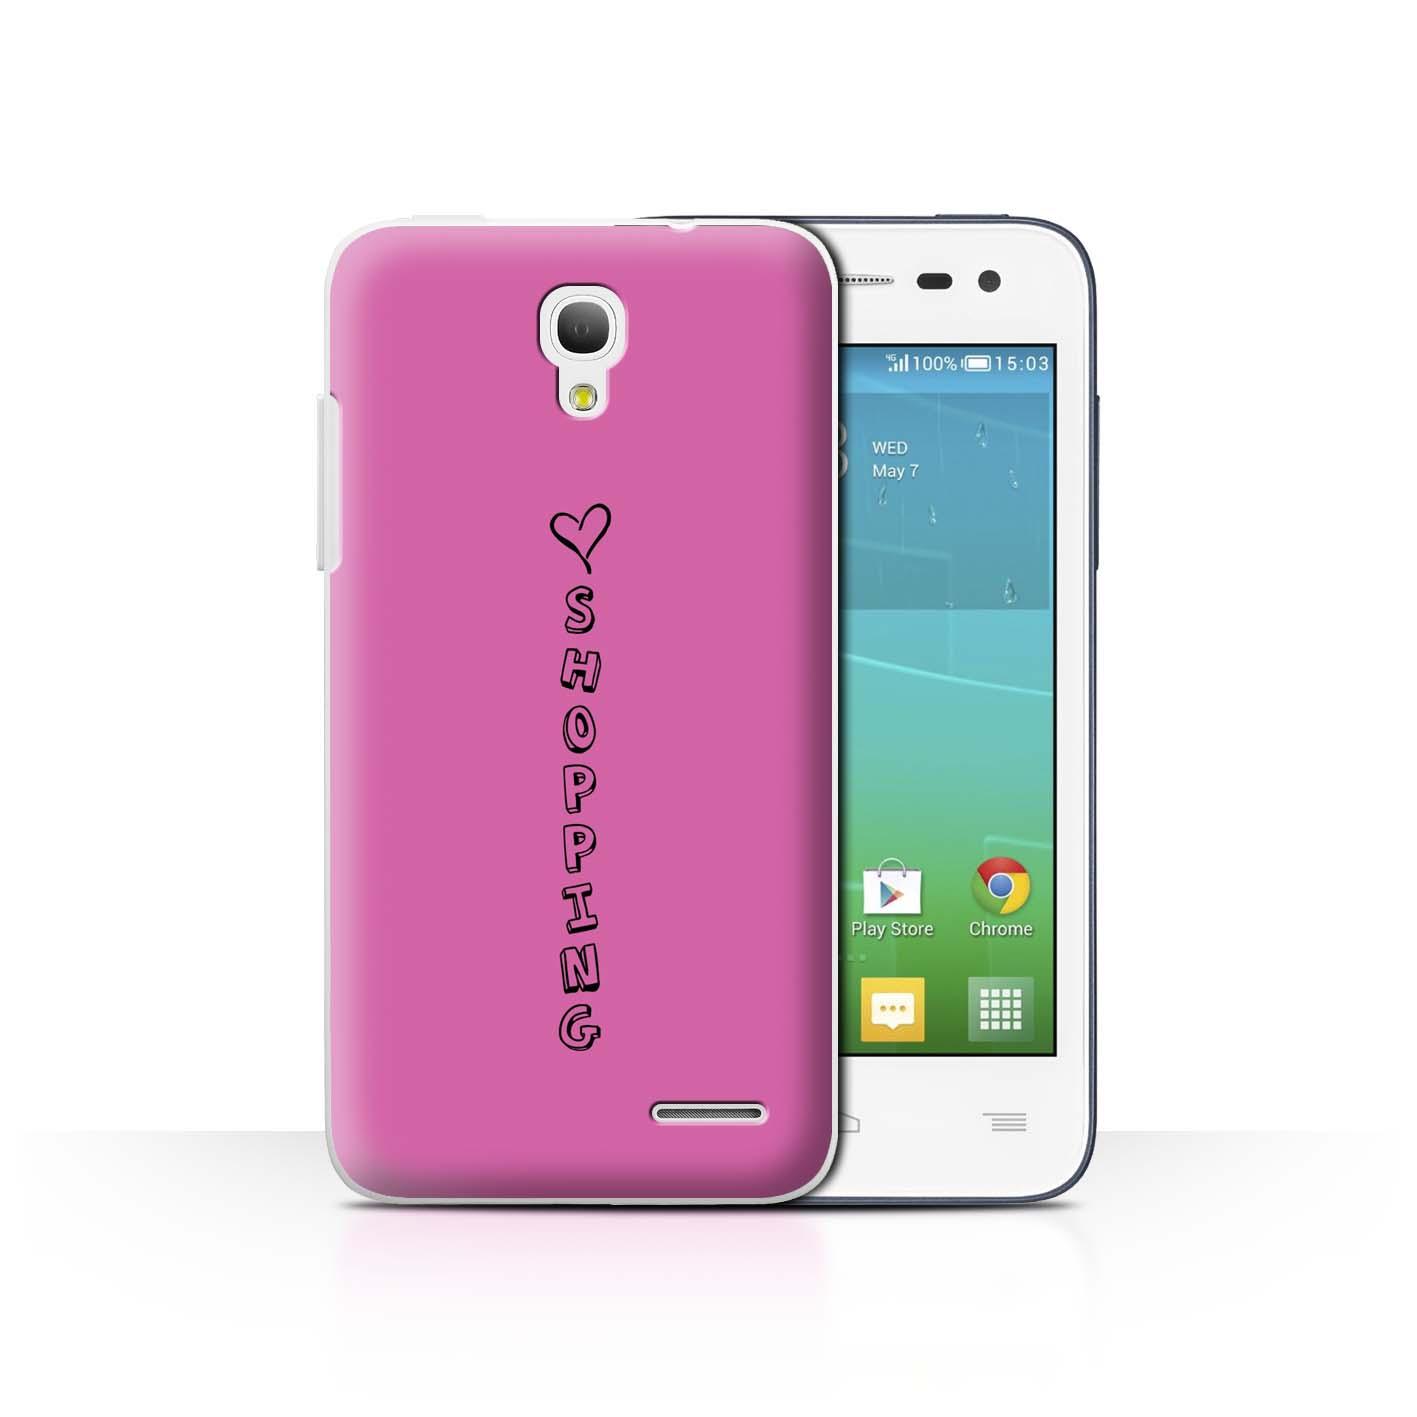 Stuff 4 teléfono caso/cubierta trasera para Alcatel OneTouch Pop S3/Corazón Xoxo